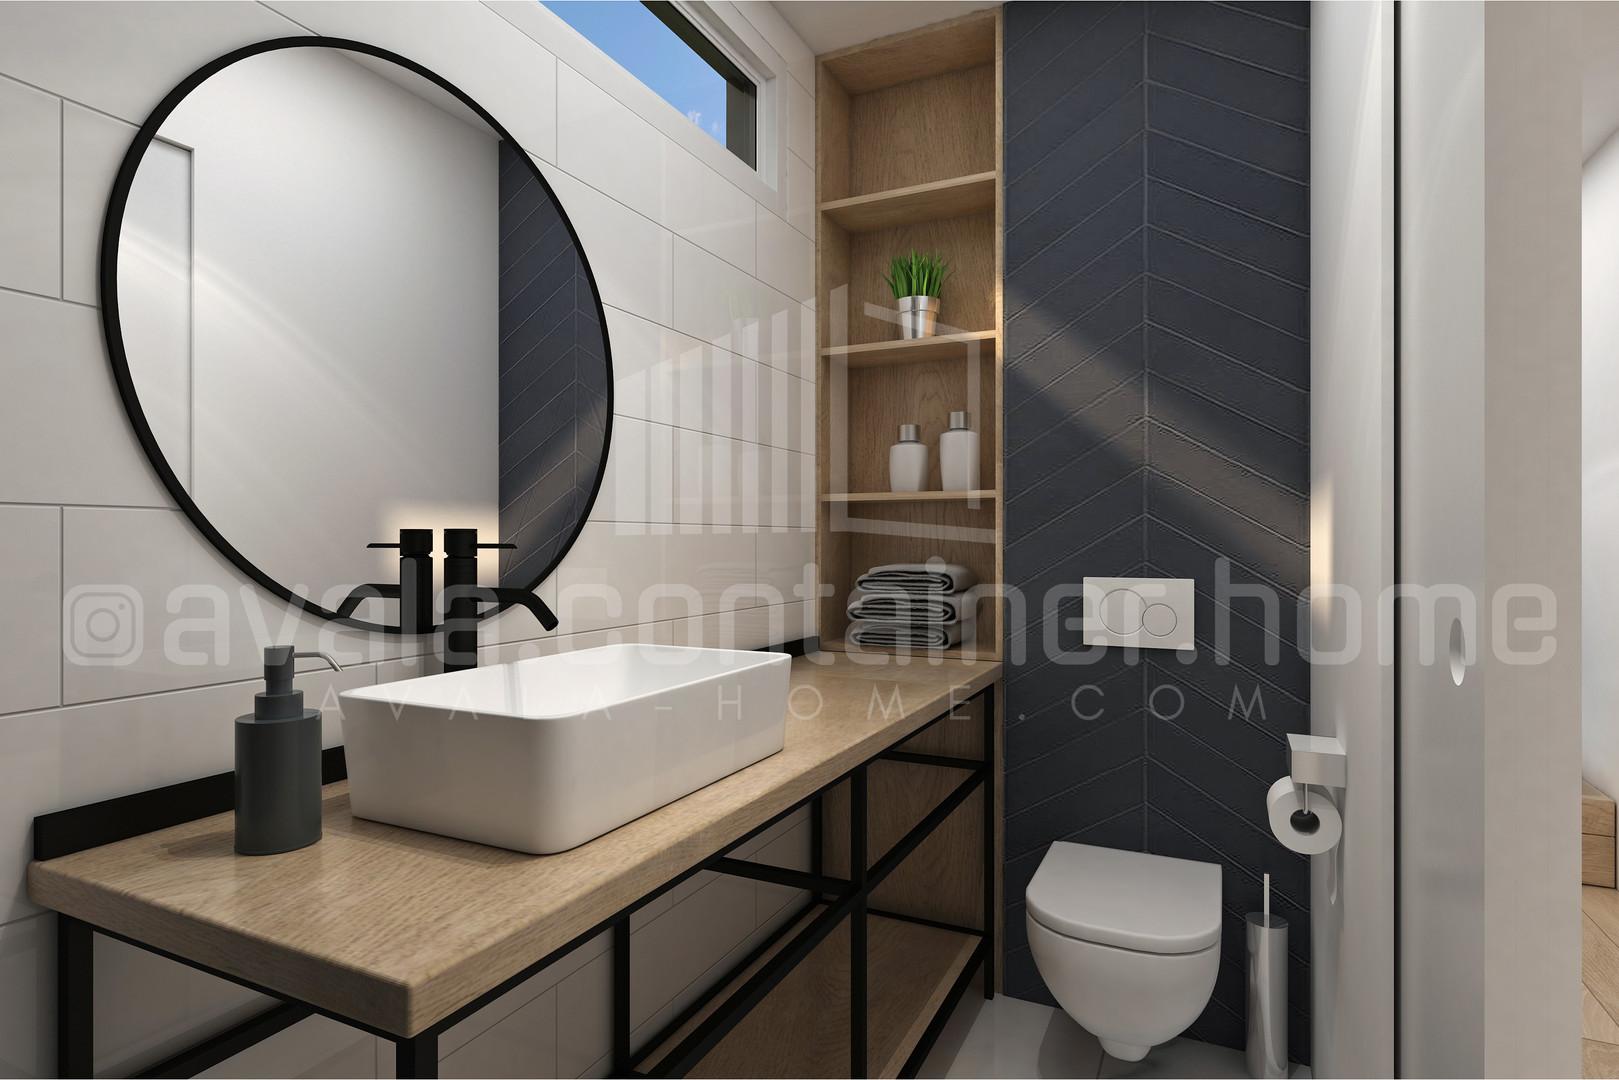 G240_Bathroom final_28-10-2020.jpg